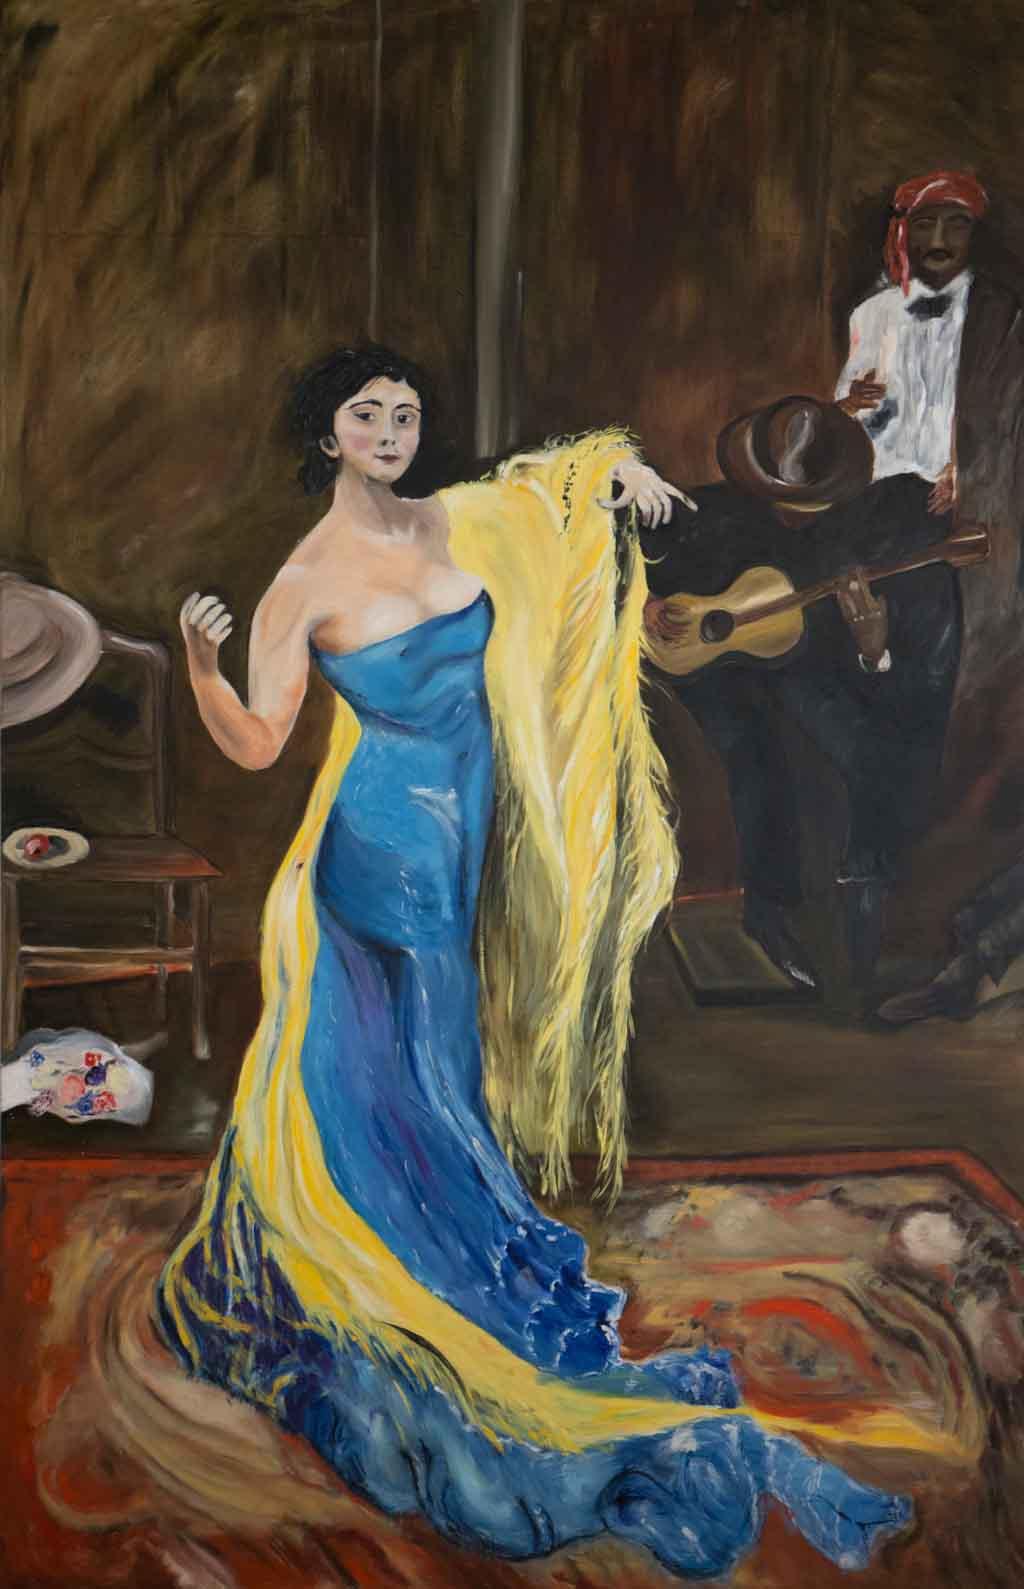 Nach Max Slevogt Marietta di Rigardo Öl 240 cm * 140 cm © Reimund Konrad